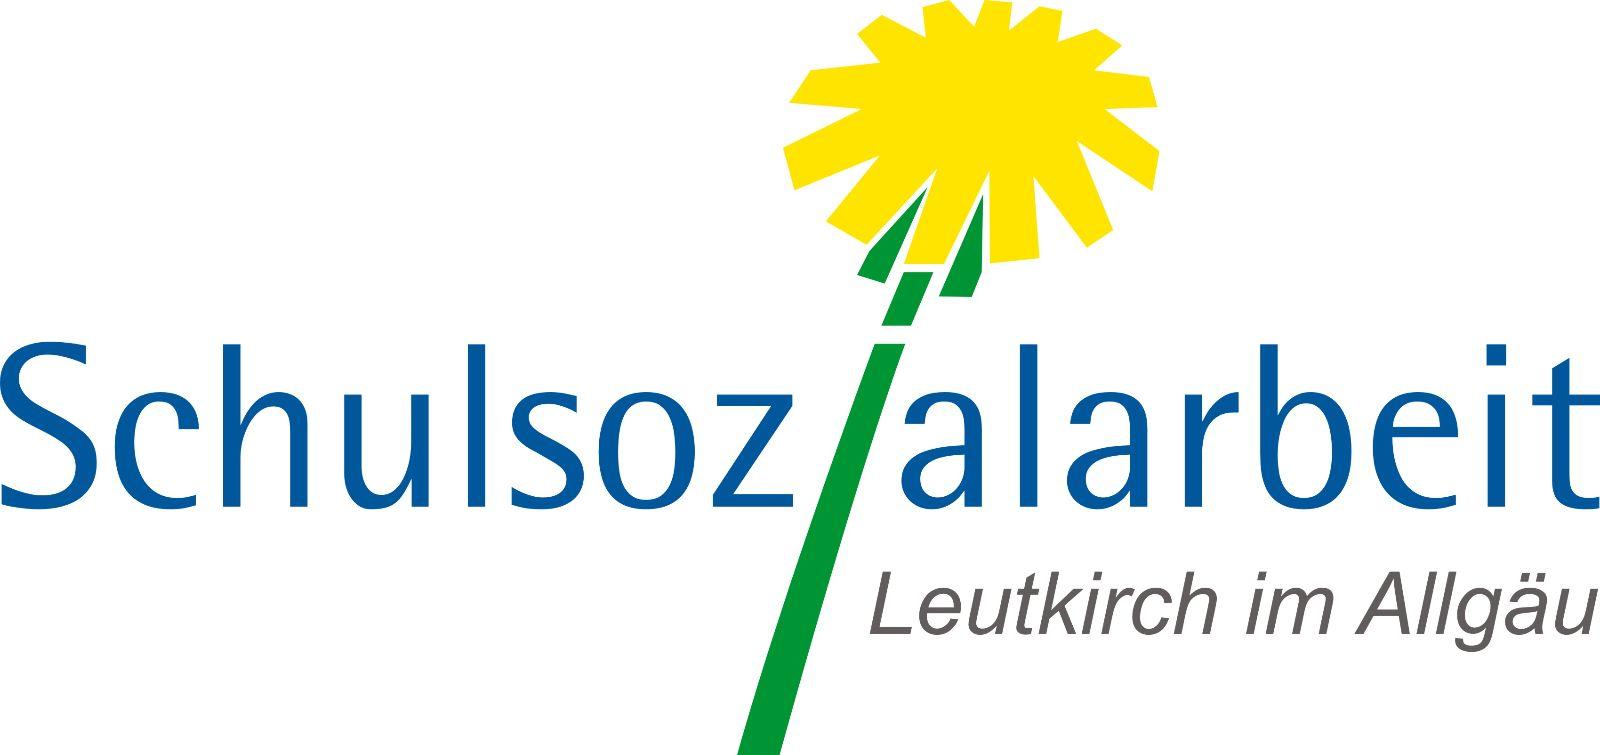 Schulsozialarbeit Leutkirch